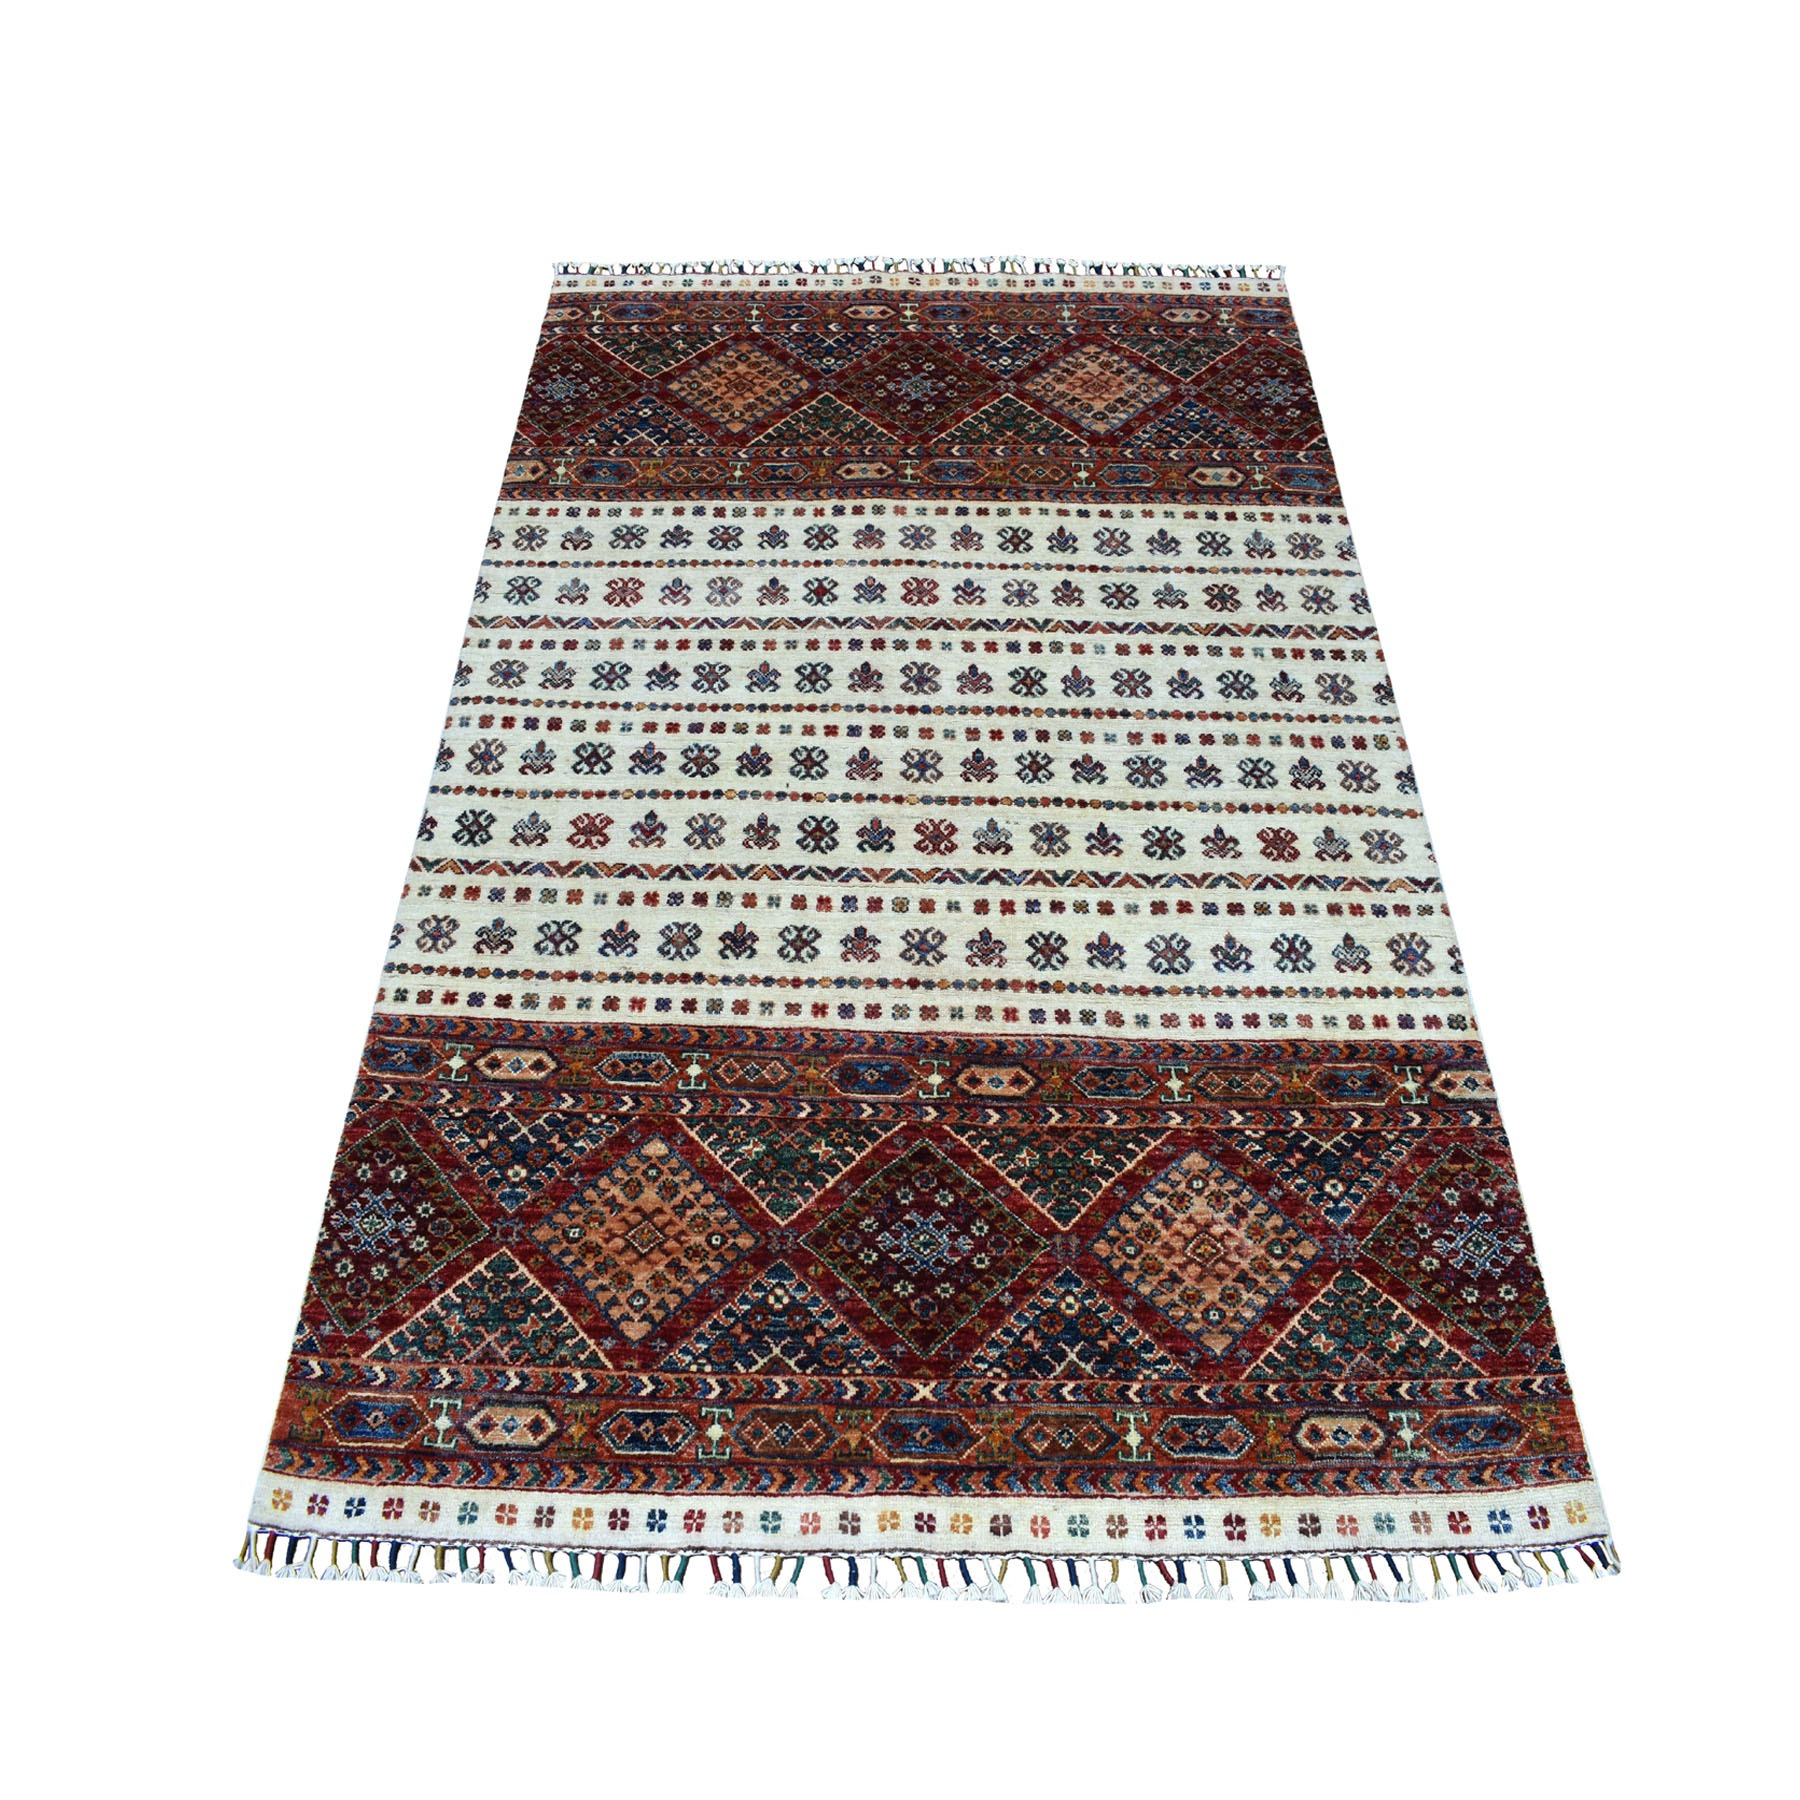 "4'10""x6'3"" Khorjin Design Colorful Super Kazak Pure Wool Hand Knotted Oriental Rug"